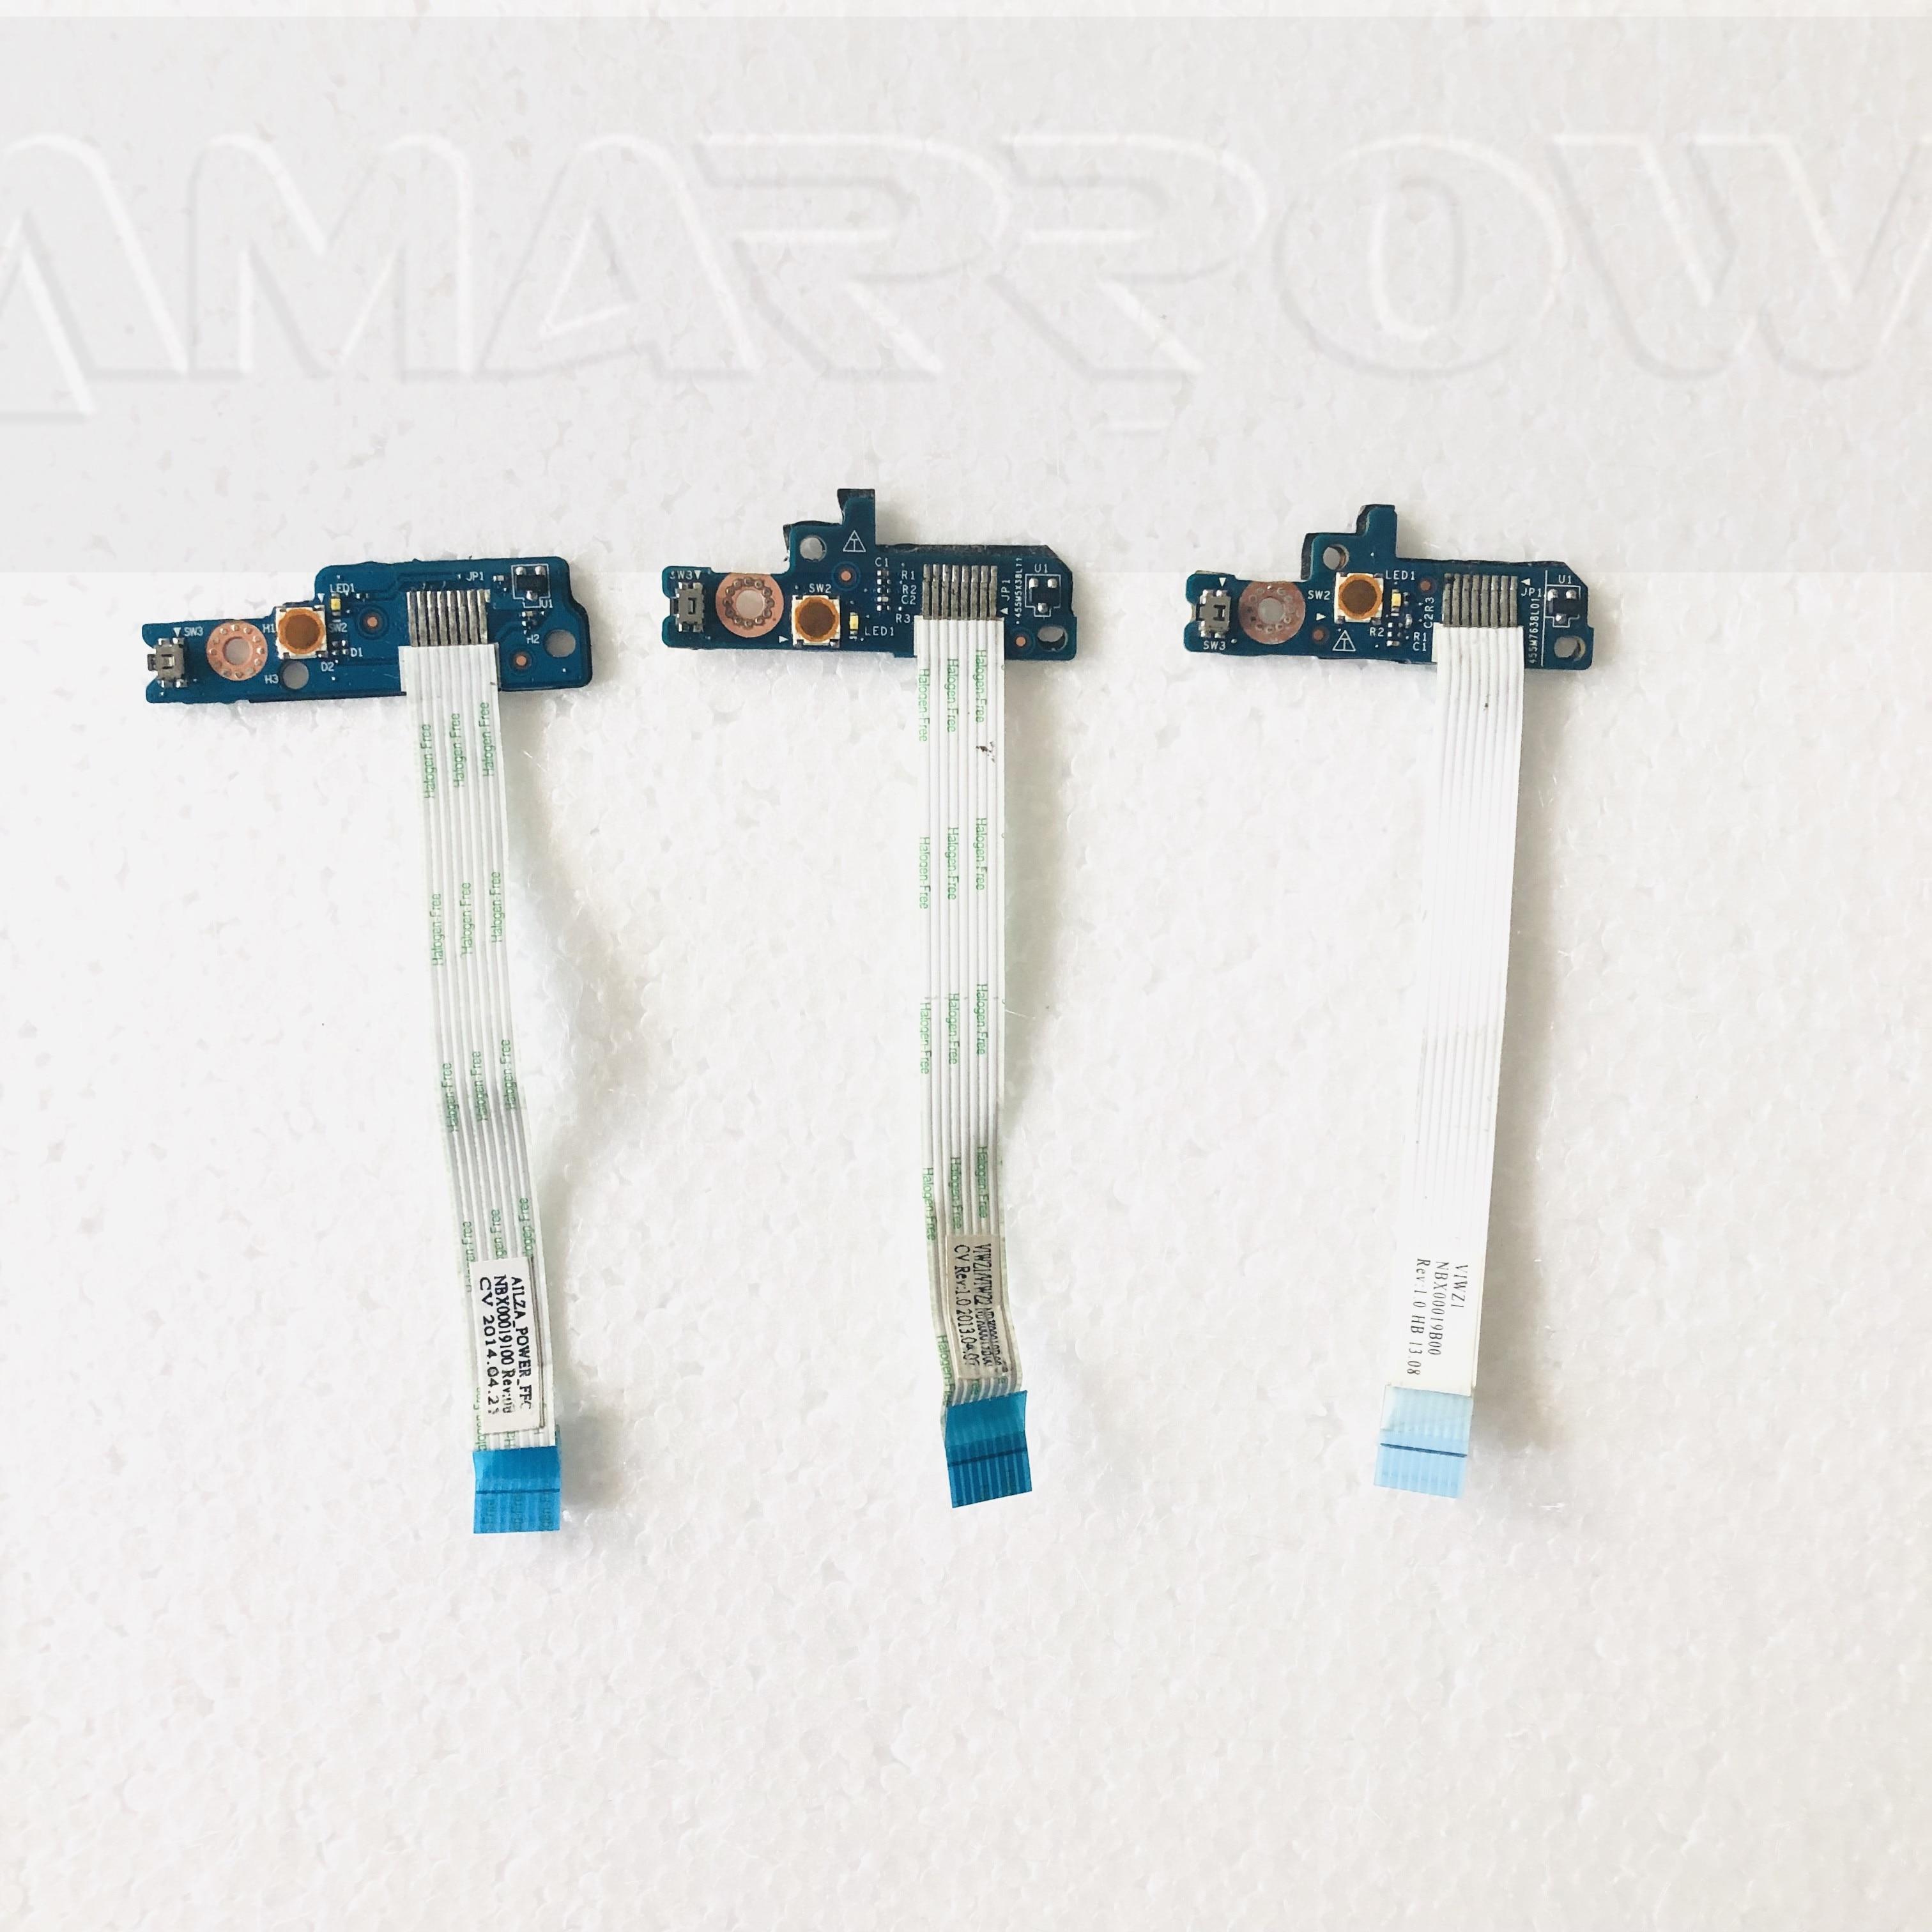 Original Free Shipping For Lenovo Z400 P400 Z500 P500 LS-9061P Z410 Z510 NS-A181 Power Button Board Switch Board